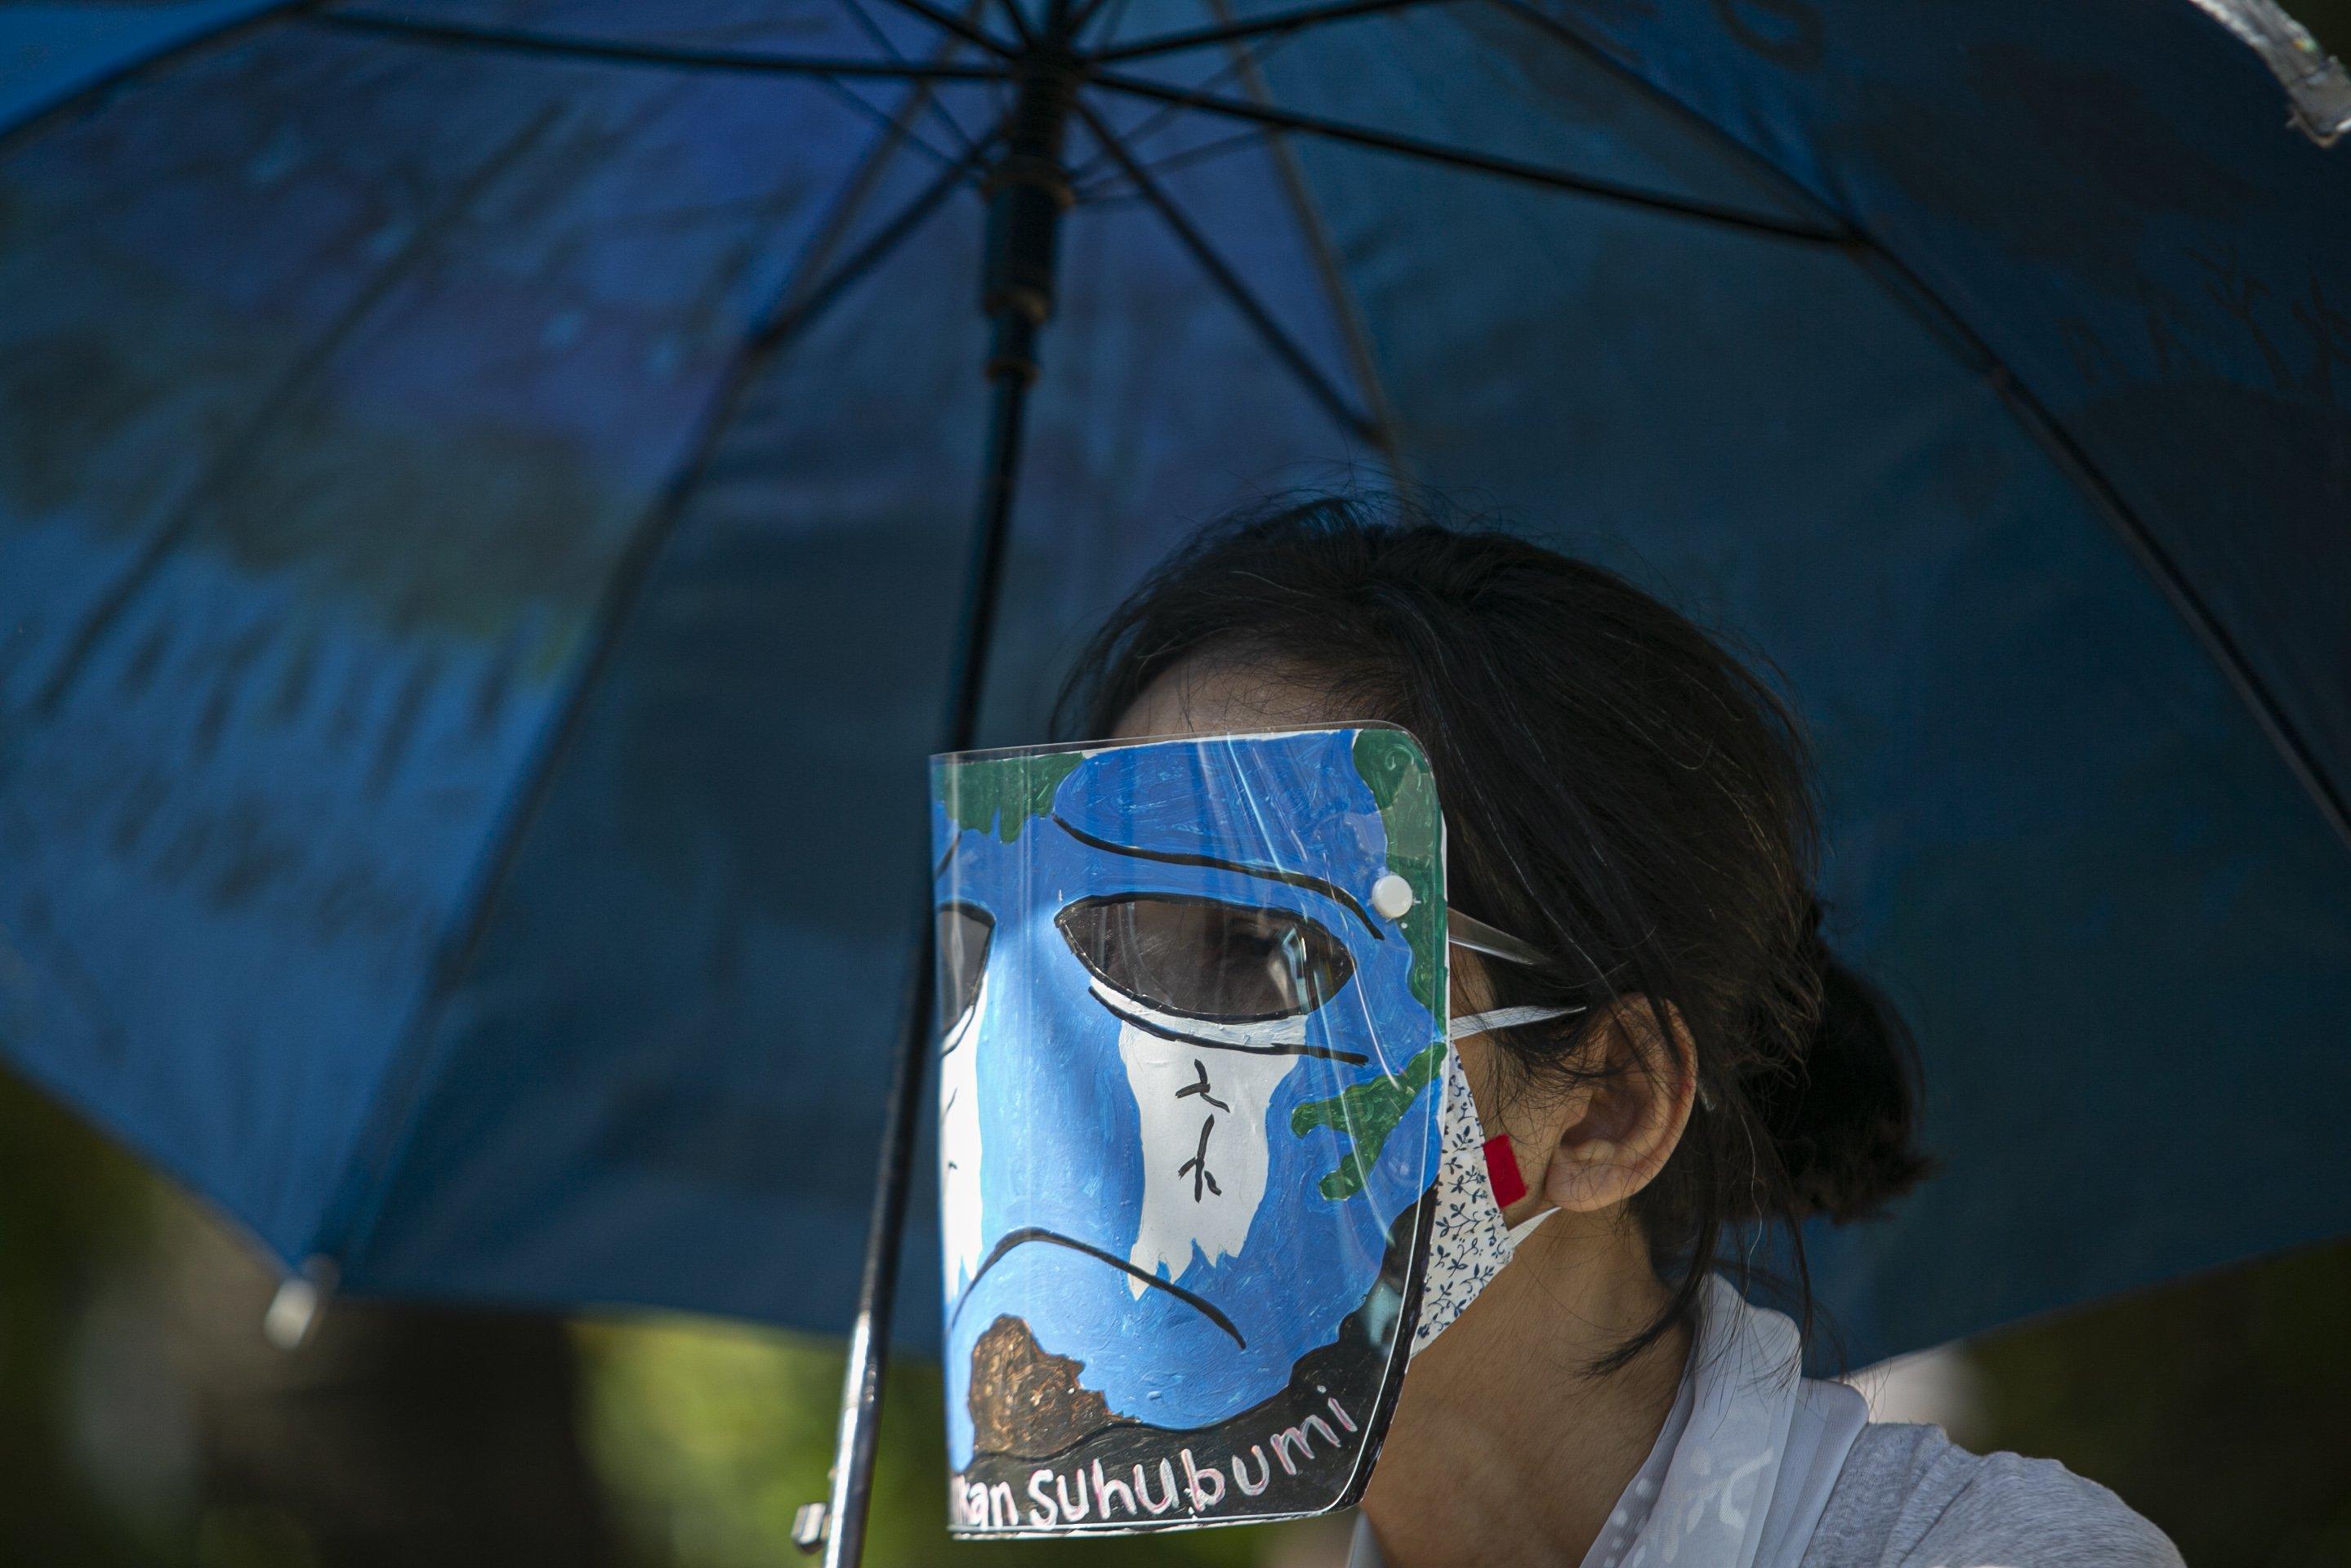 Massa yang tergabung dalam aksi jeda untuk iklim berunjuk rasa di depan Balaikota, Jakarta Pusat, Jumat (27/11/2020). Aksi tersebut bertujuan menyuarakan tuntutan agar pemerintah melakukan tindakan nyata dalam menyelesaikan masalah polusi, kebakaran hutan dan eksploitasi alam.